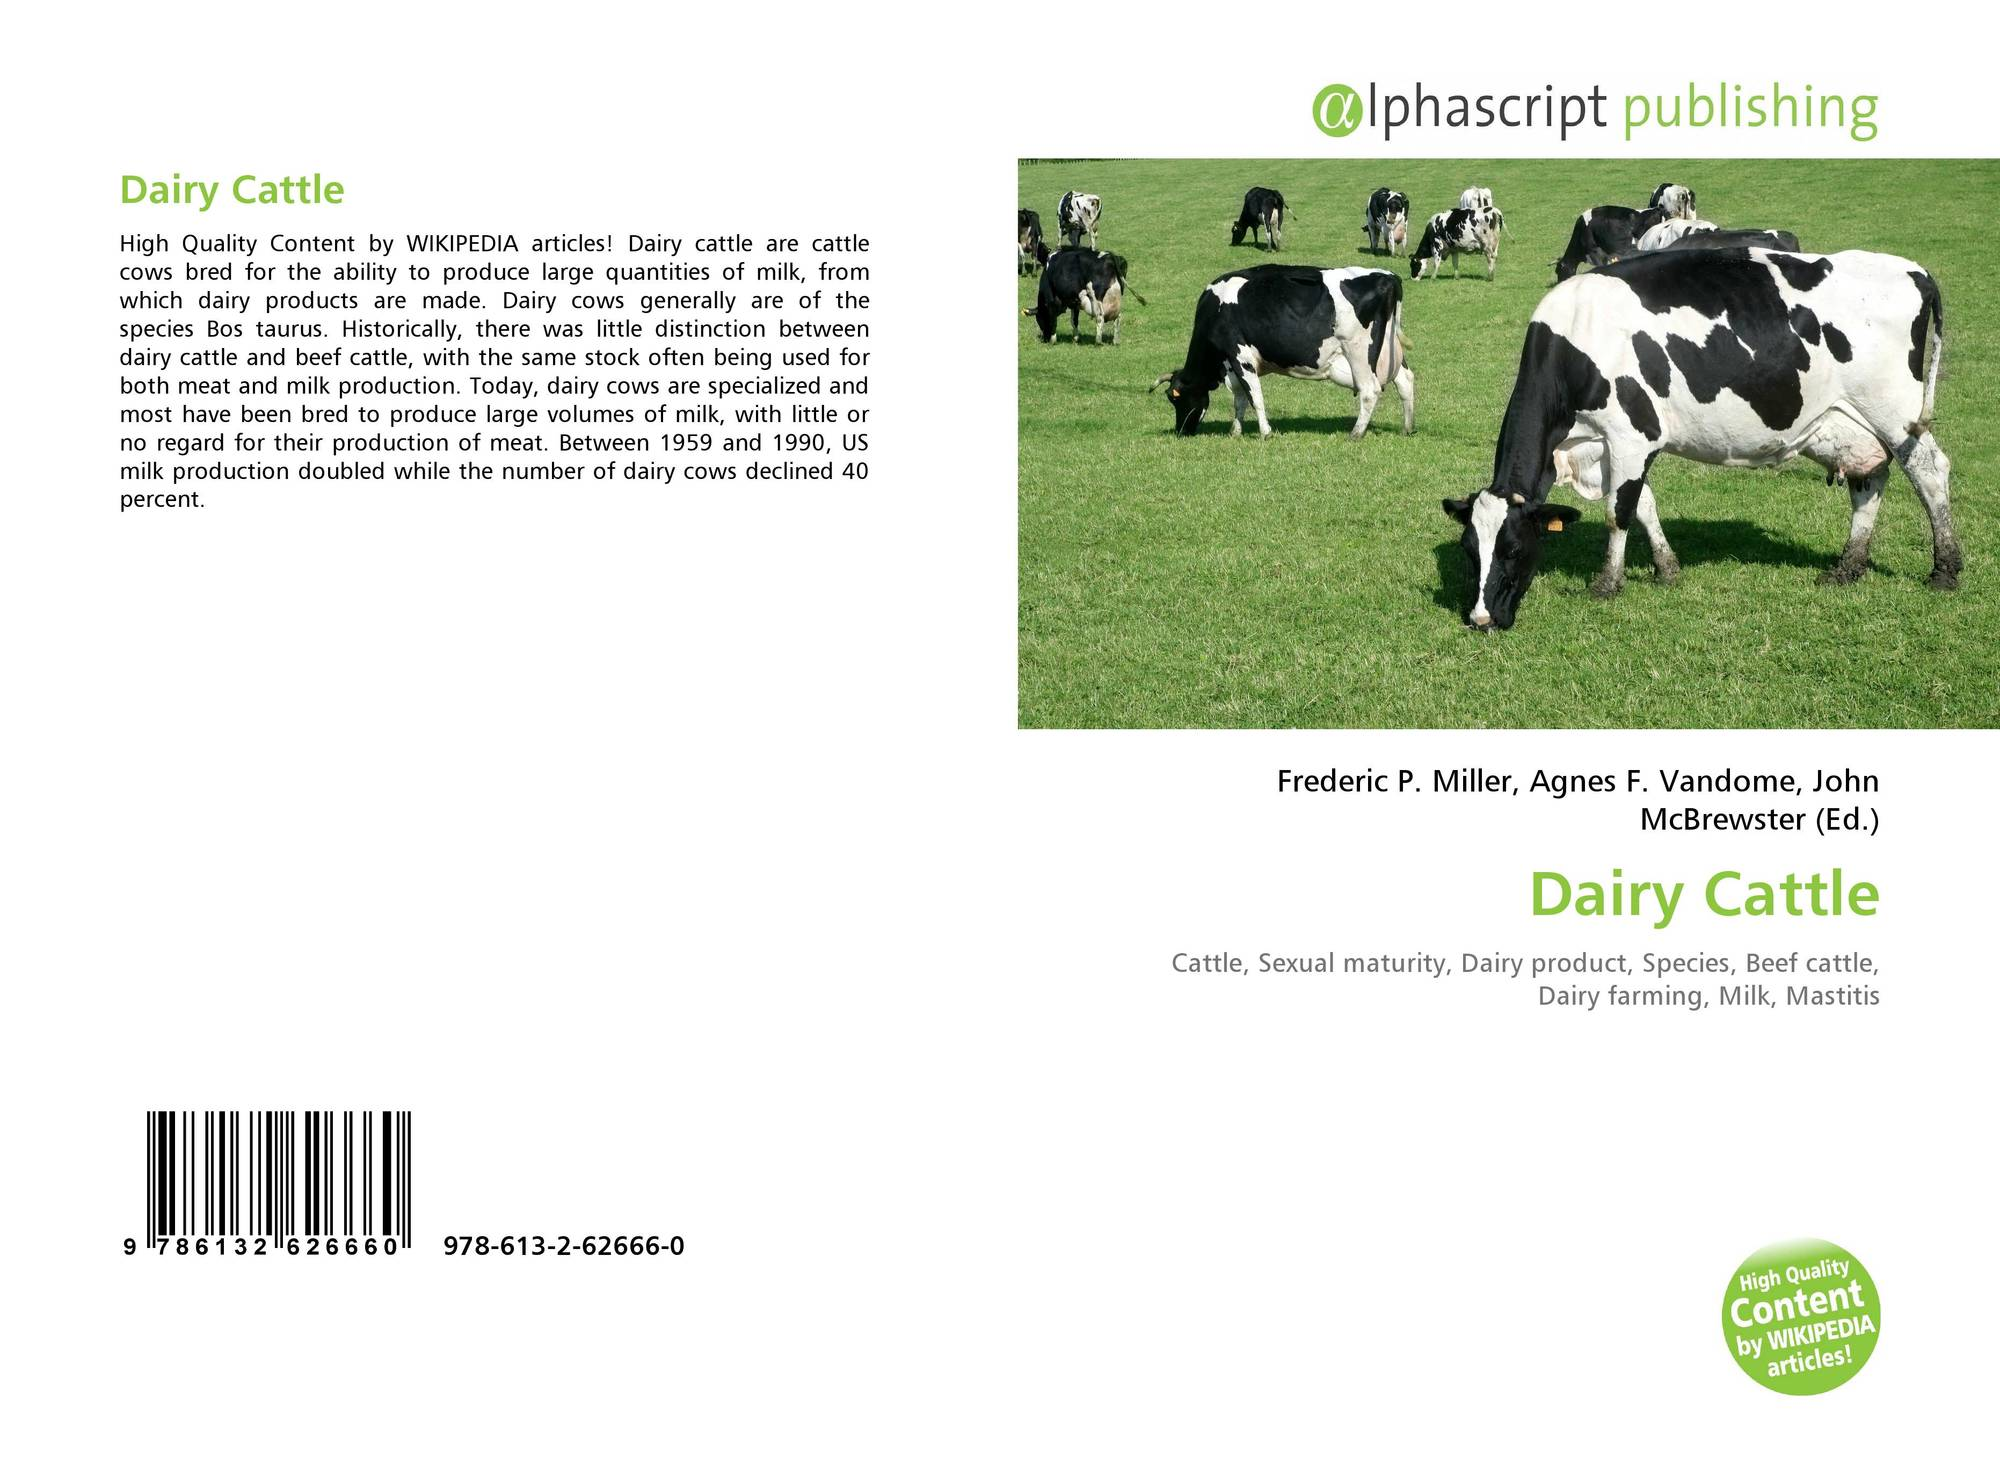 Dairy-bull search app created | Dairy | agupdate.com